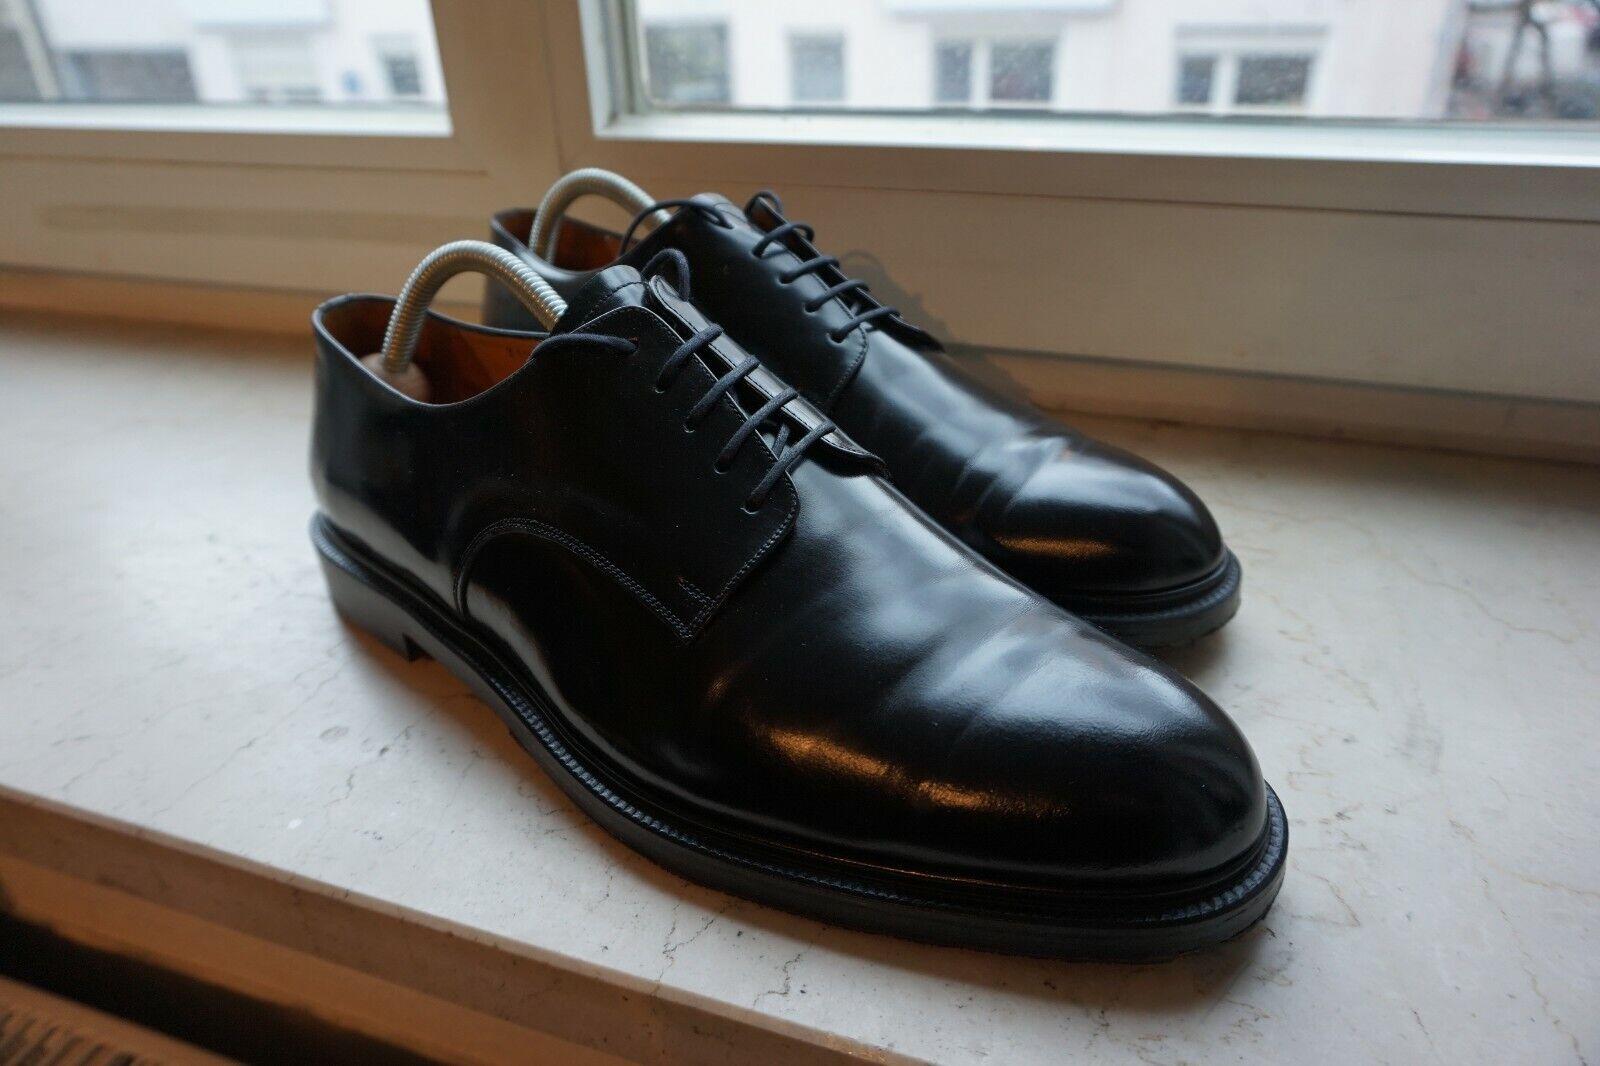 Zapato - Lederschuhe, Anzugschuhe, Größe 47,5 bzw. 13 US, 12 UK